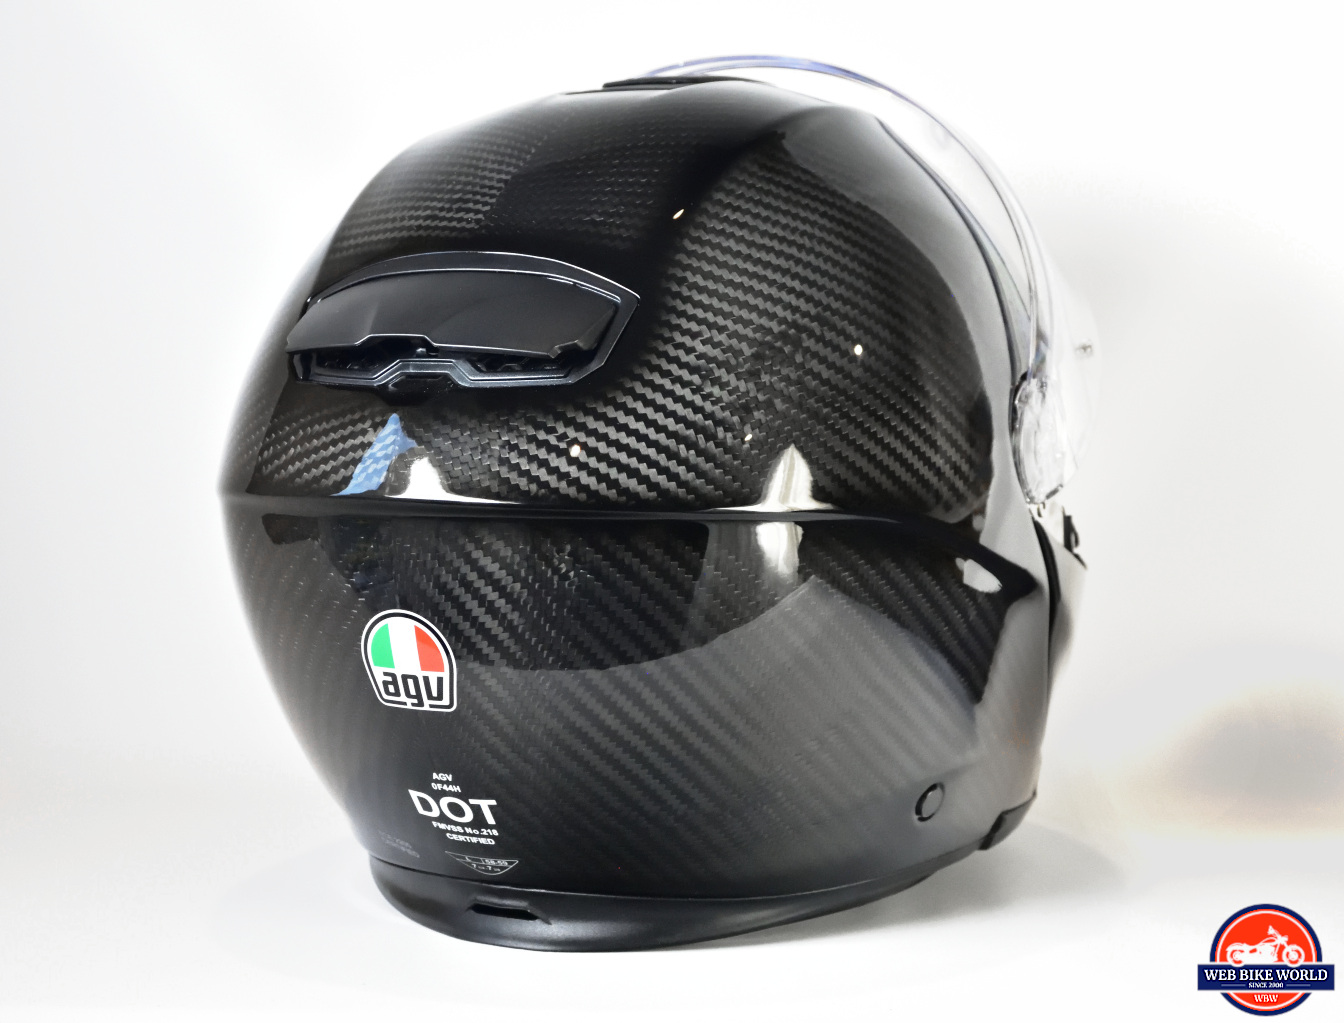 Agv Sportmodular Carbon Helmet Hands On Review So Very Good